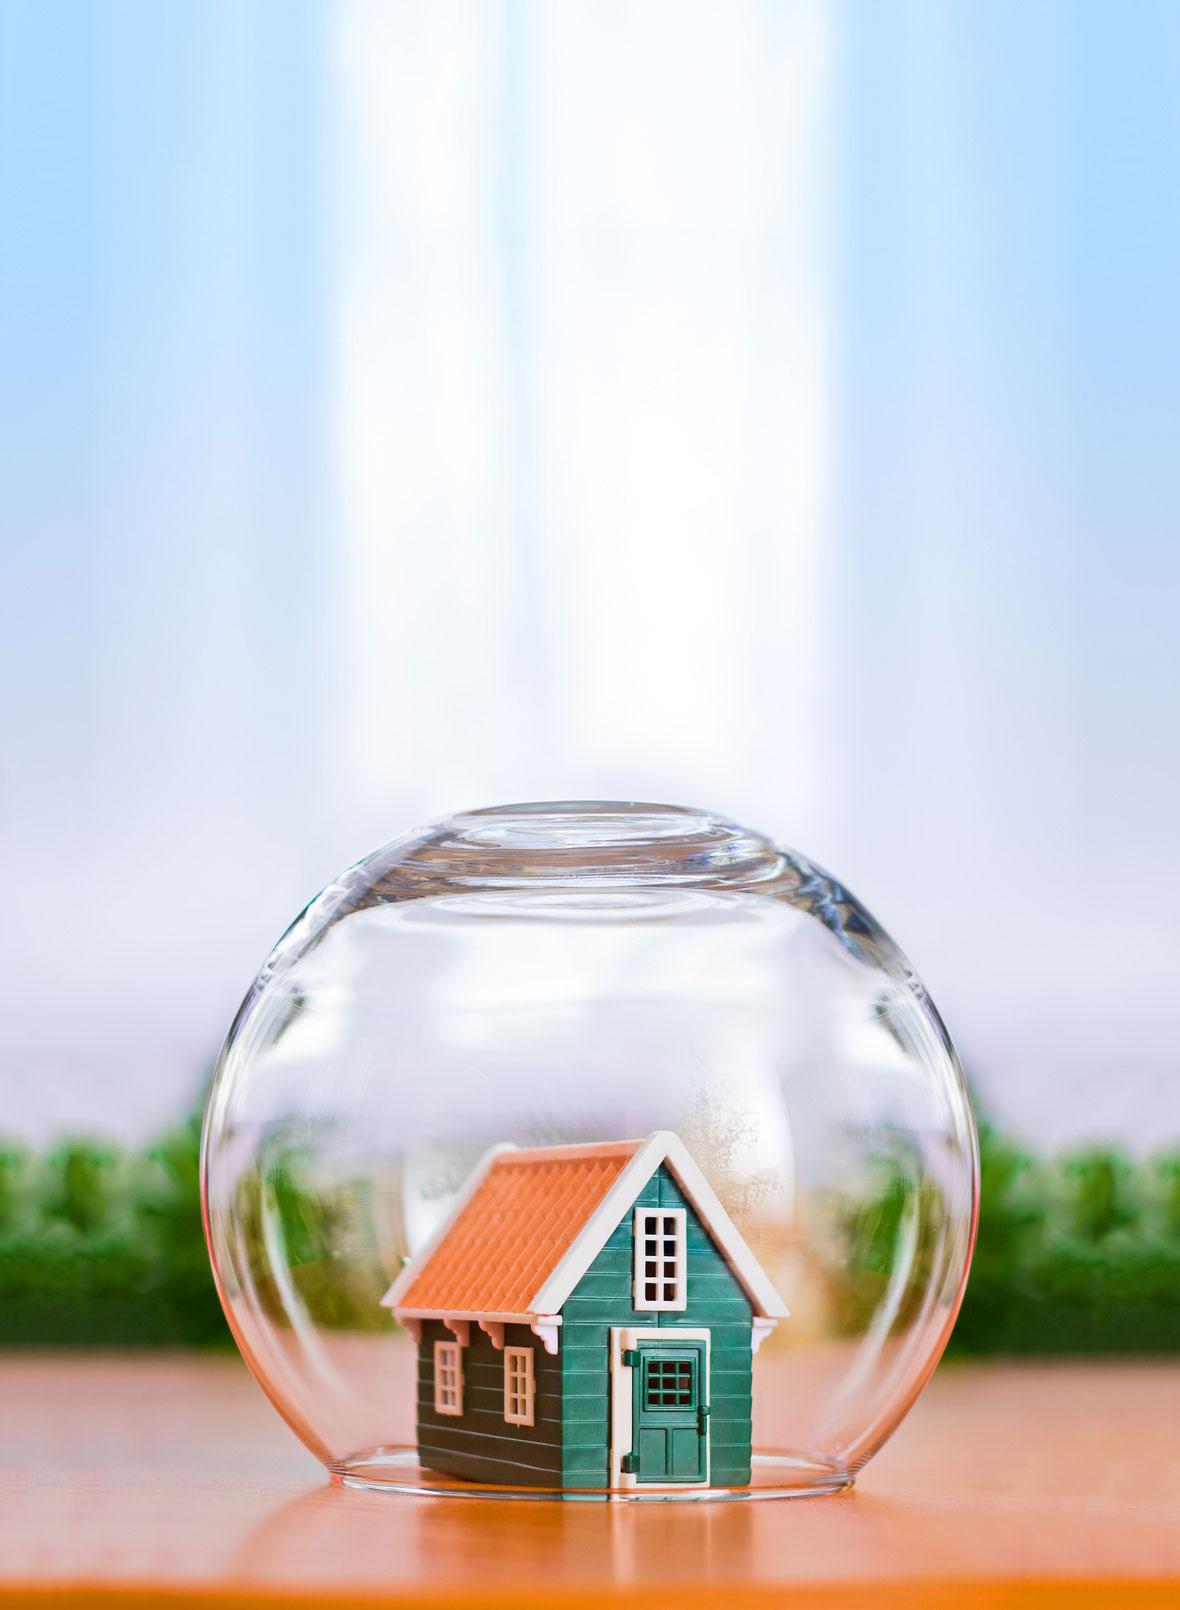 Home Insurance Gaps Kent, WA